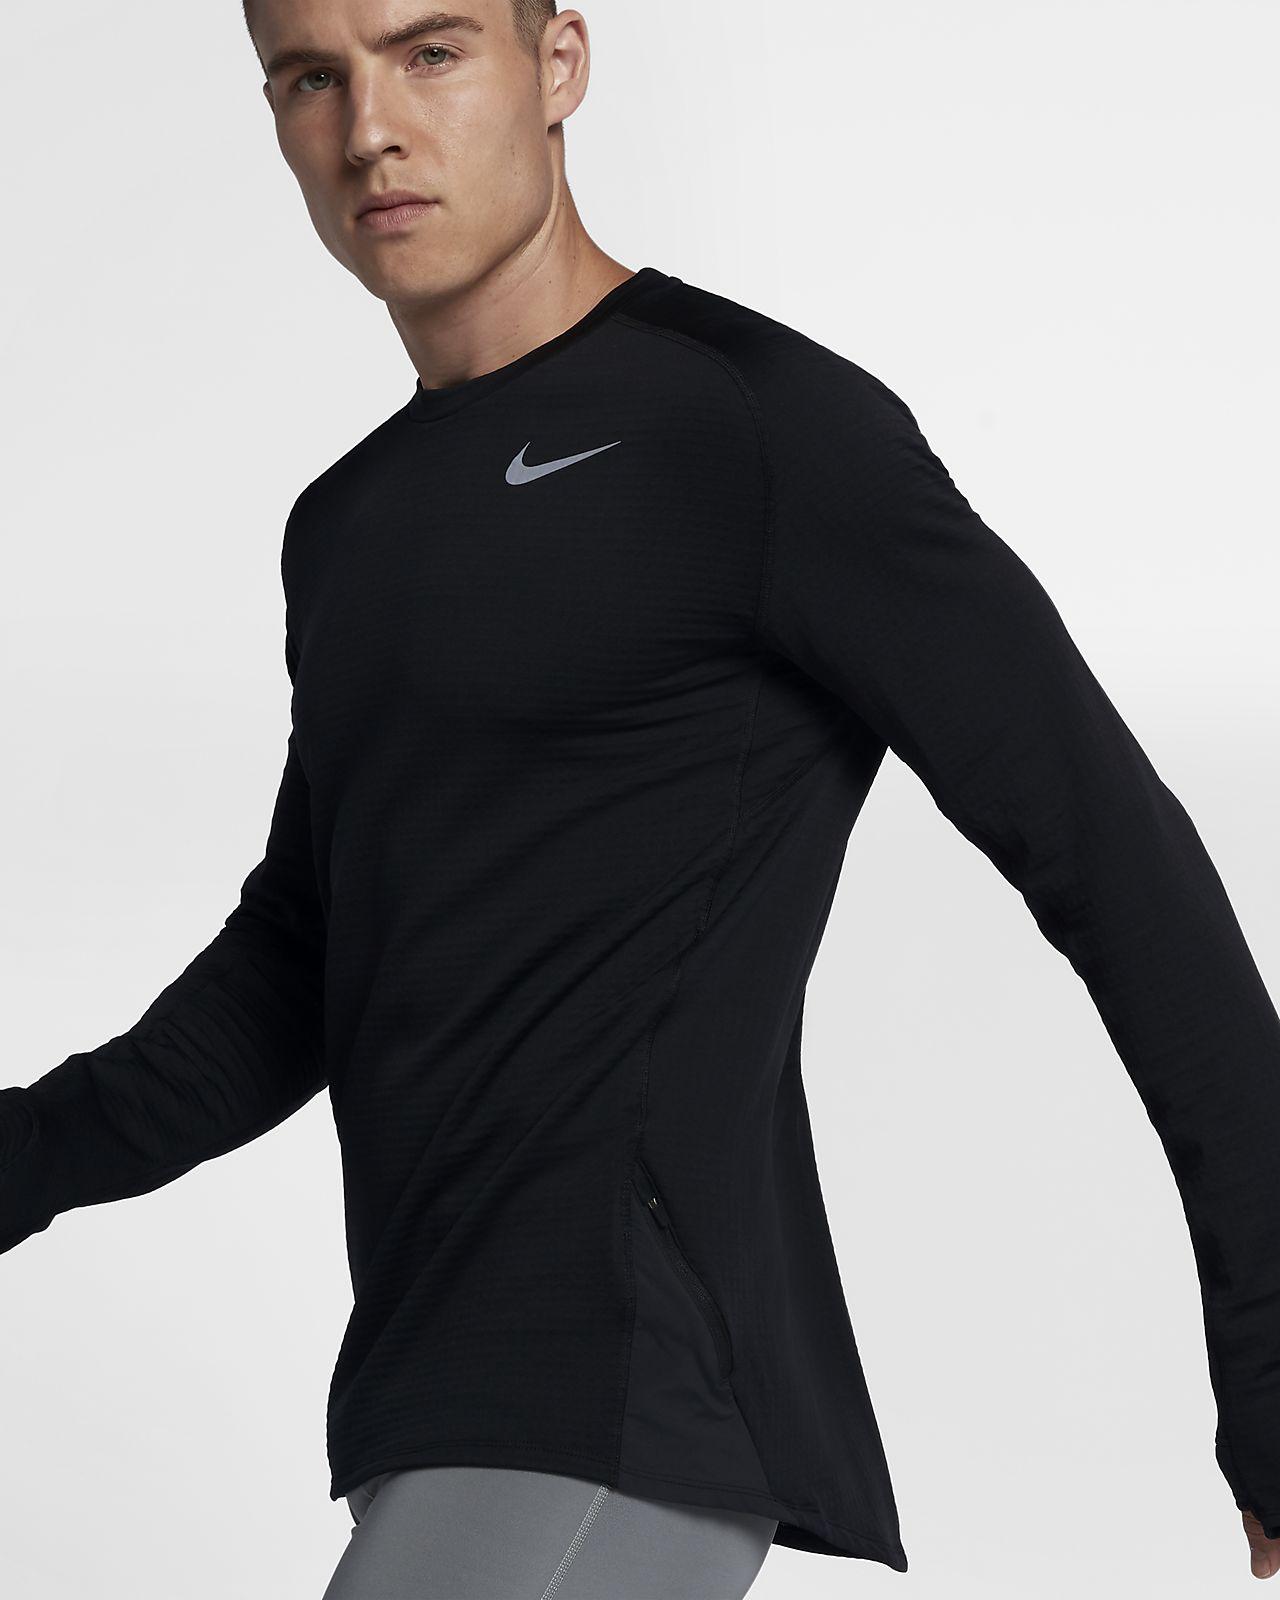 ab0327d60 Nike Therma-Sphere Men's Long-Sleeve Running Top. Nike.com CA